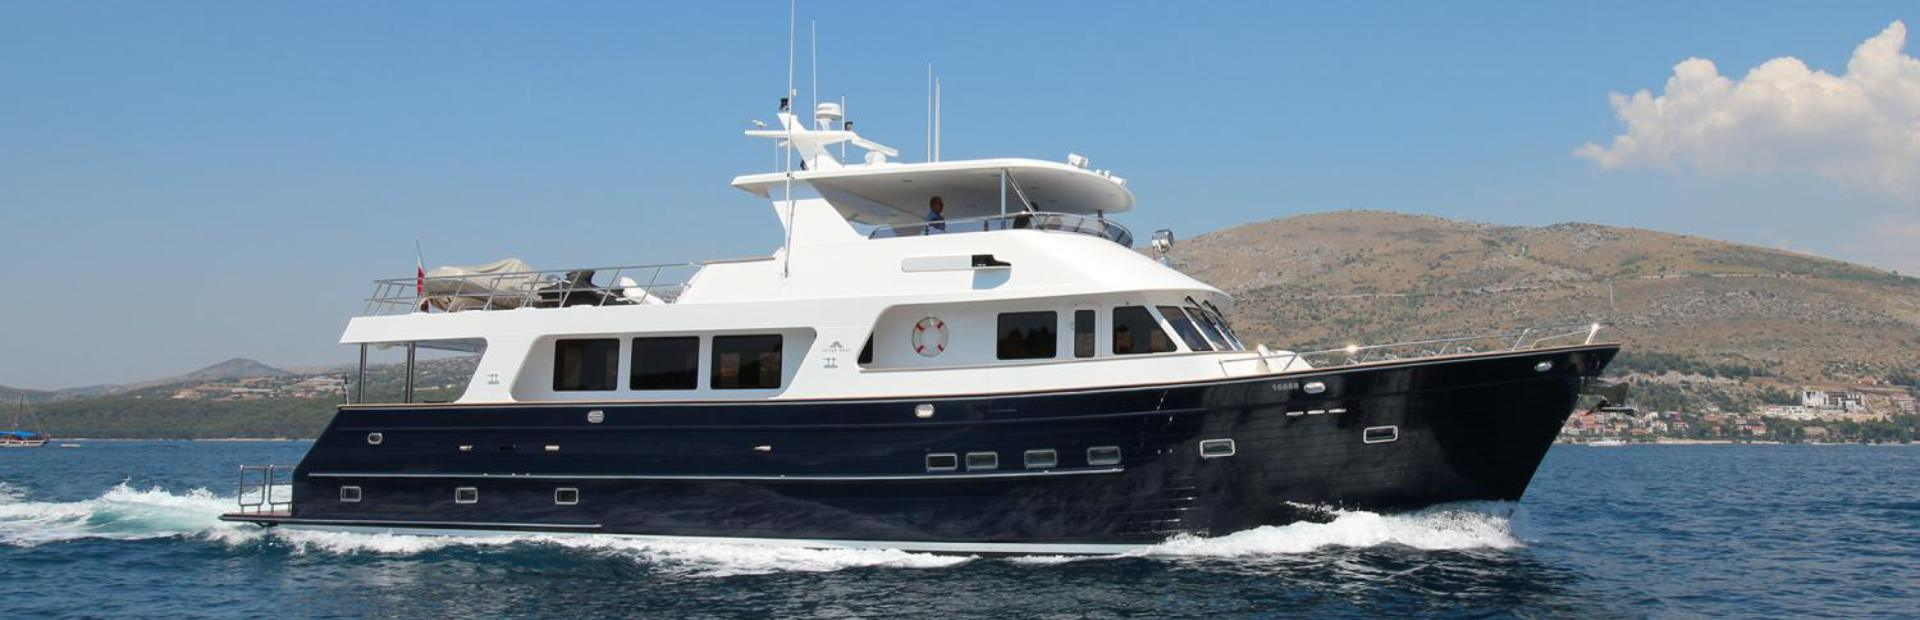 800 / 24m Motoryacht Yacht Charter